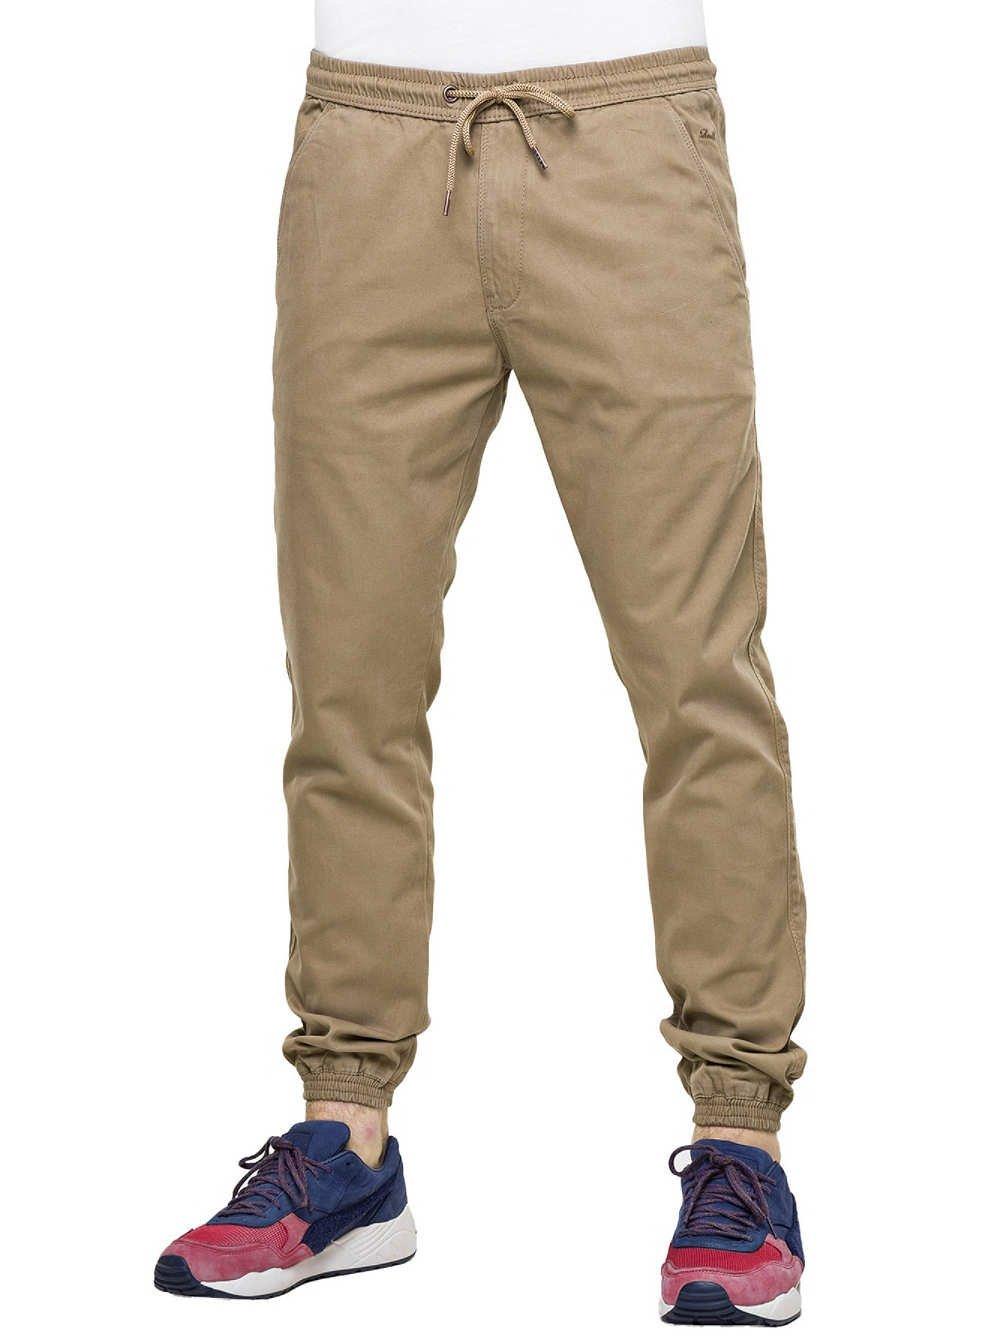 Reell Jeans Uomo Pantaloni in tela Reflex Twill